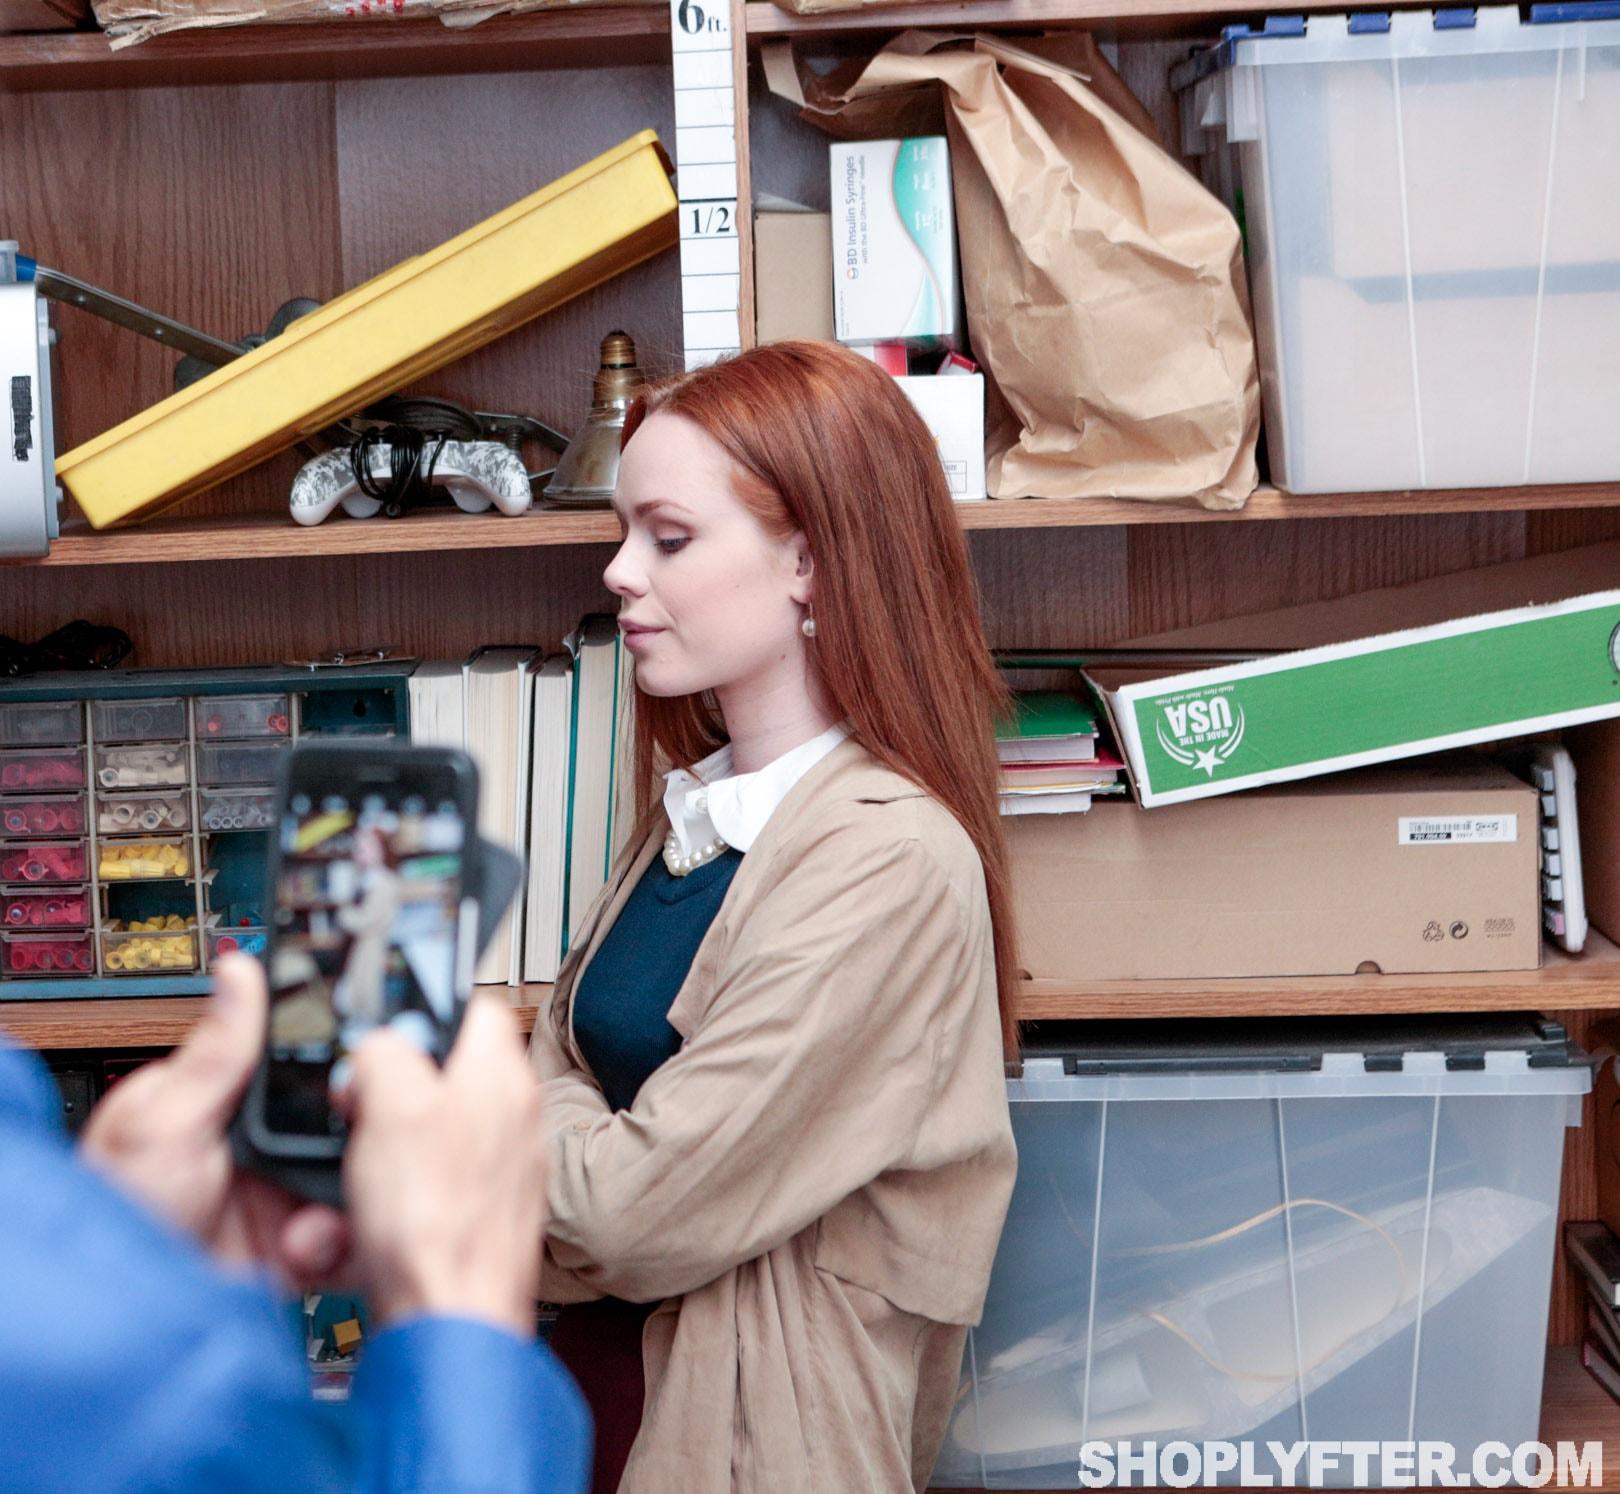 Team Skeet 'Case No. 5144158' starring Ella Hughes (Photo 30)